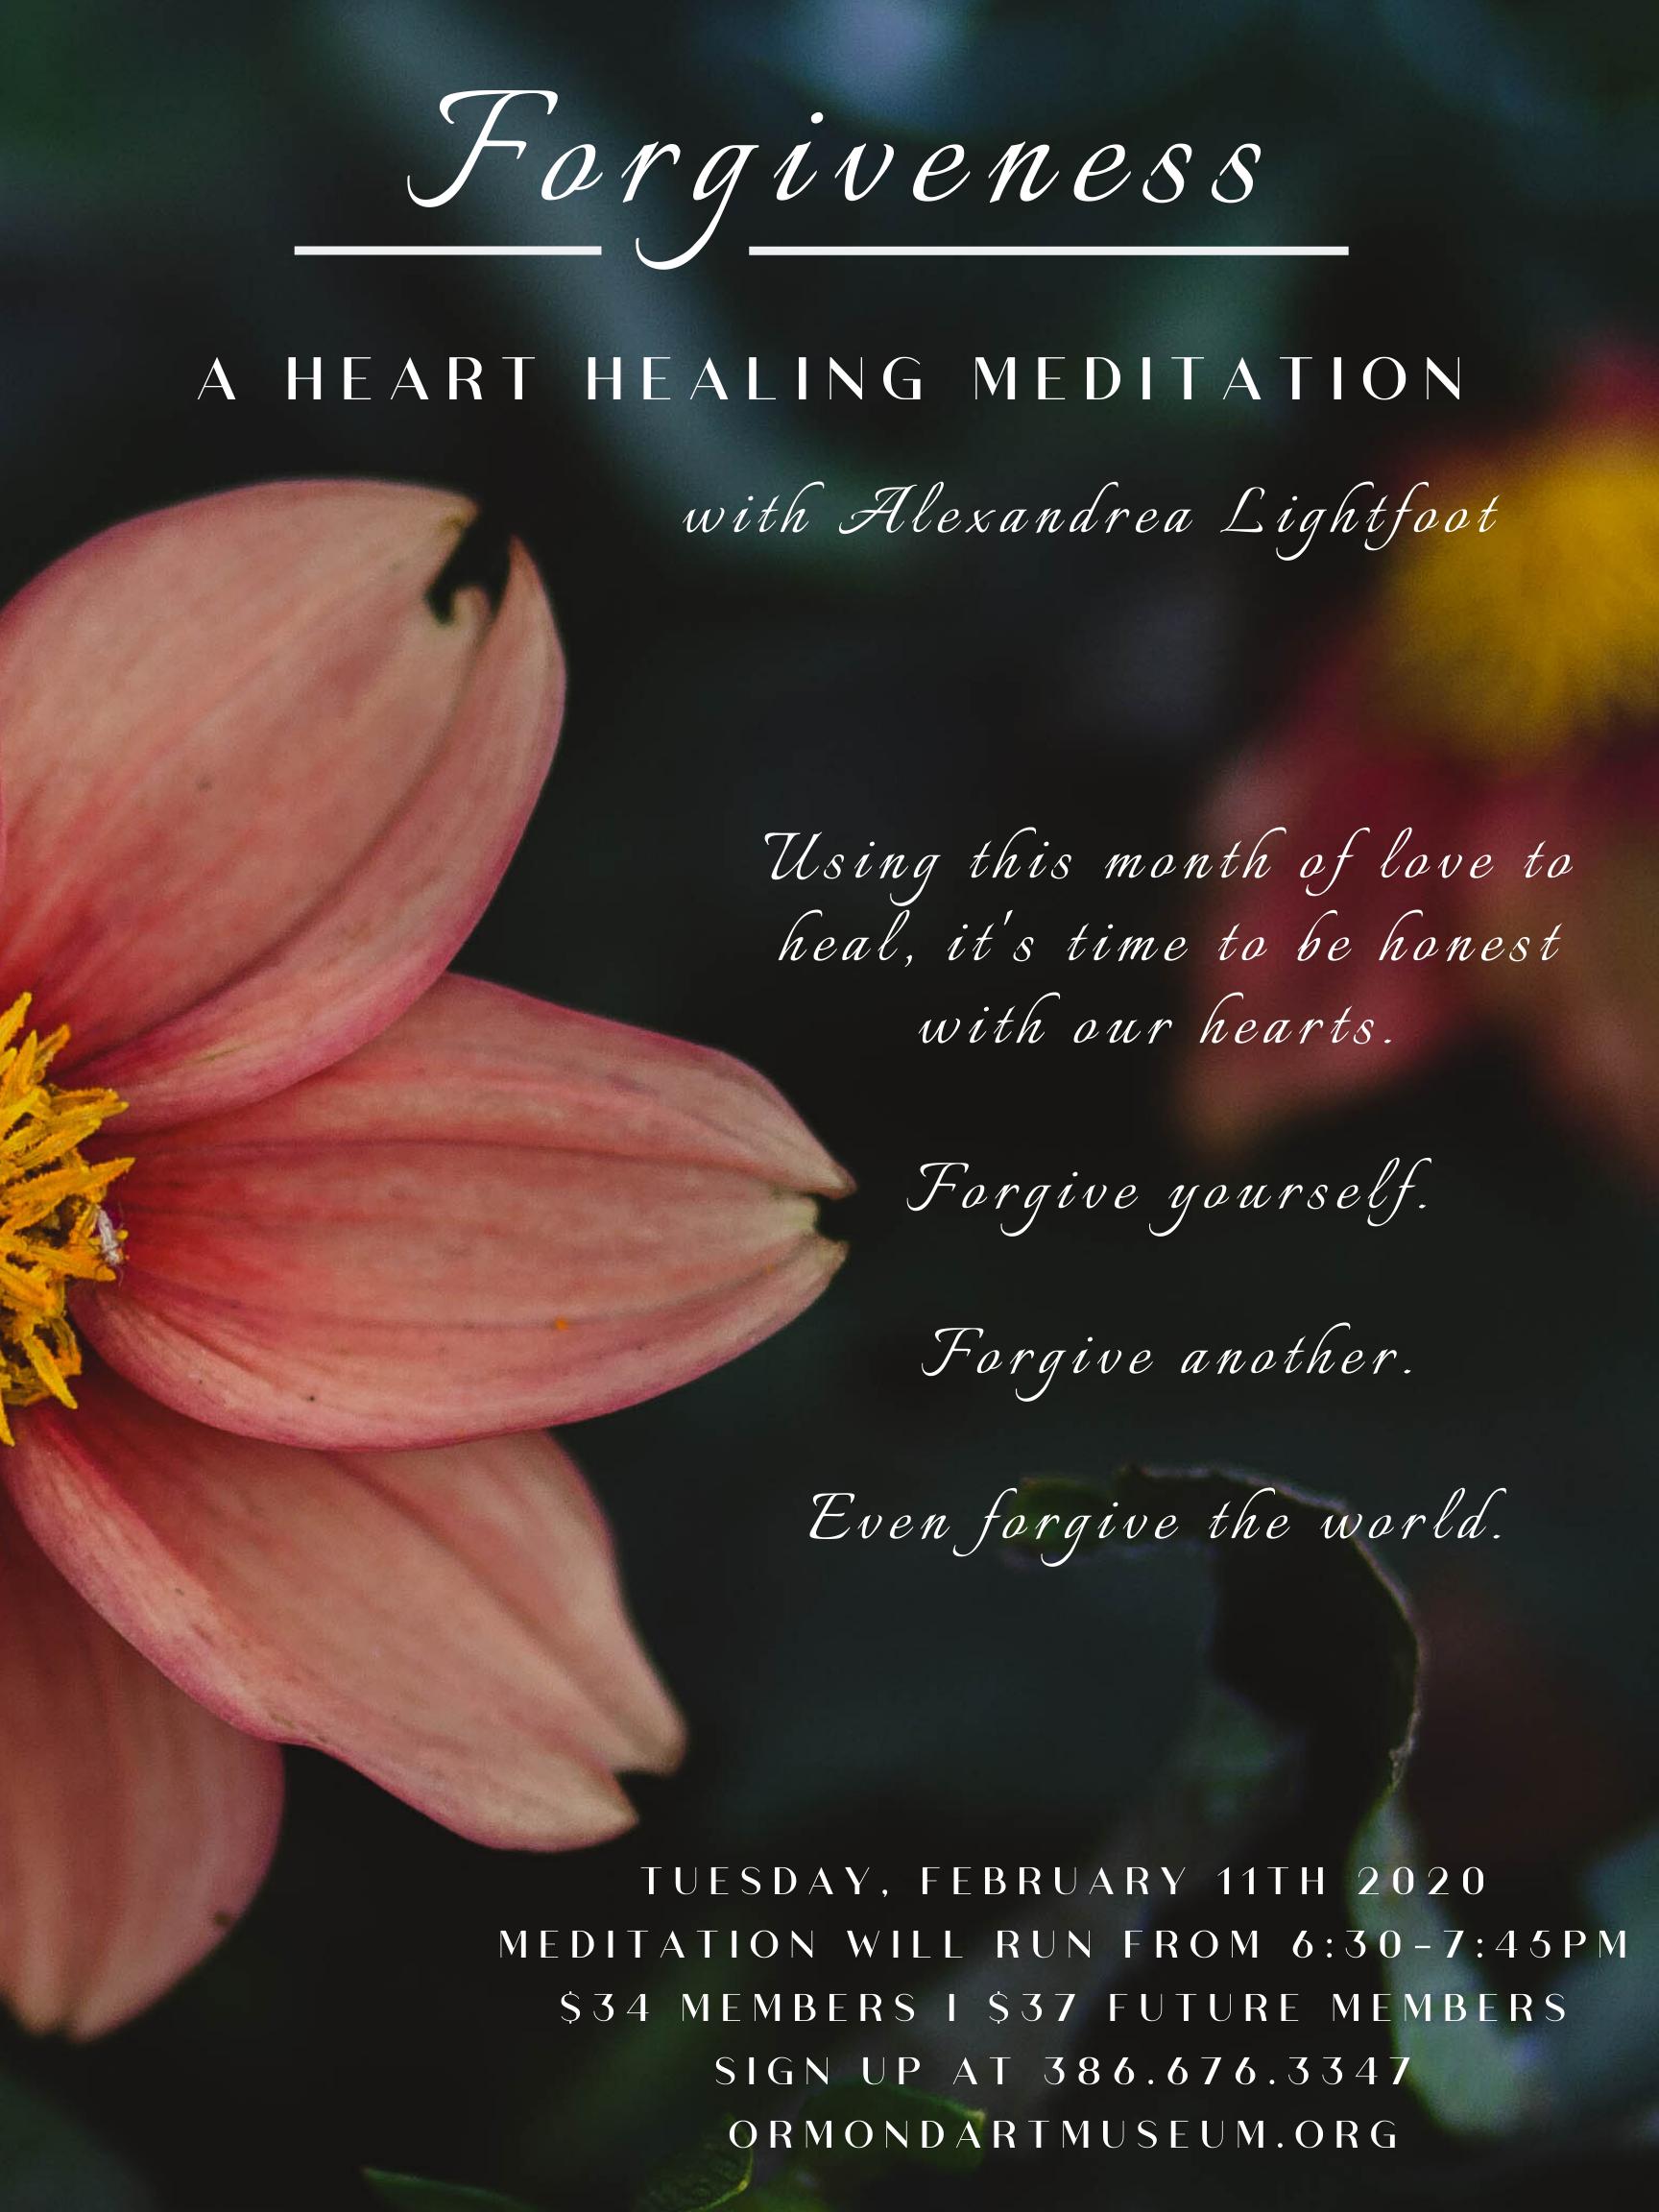 Forgiveness: A Heart Healing Meditation with Alexandrea Lightfoot